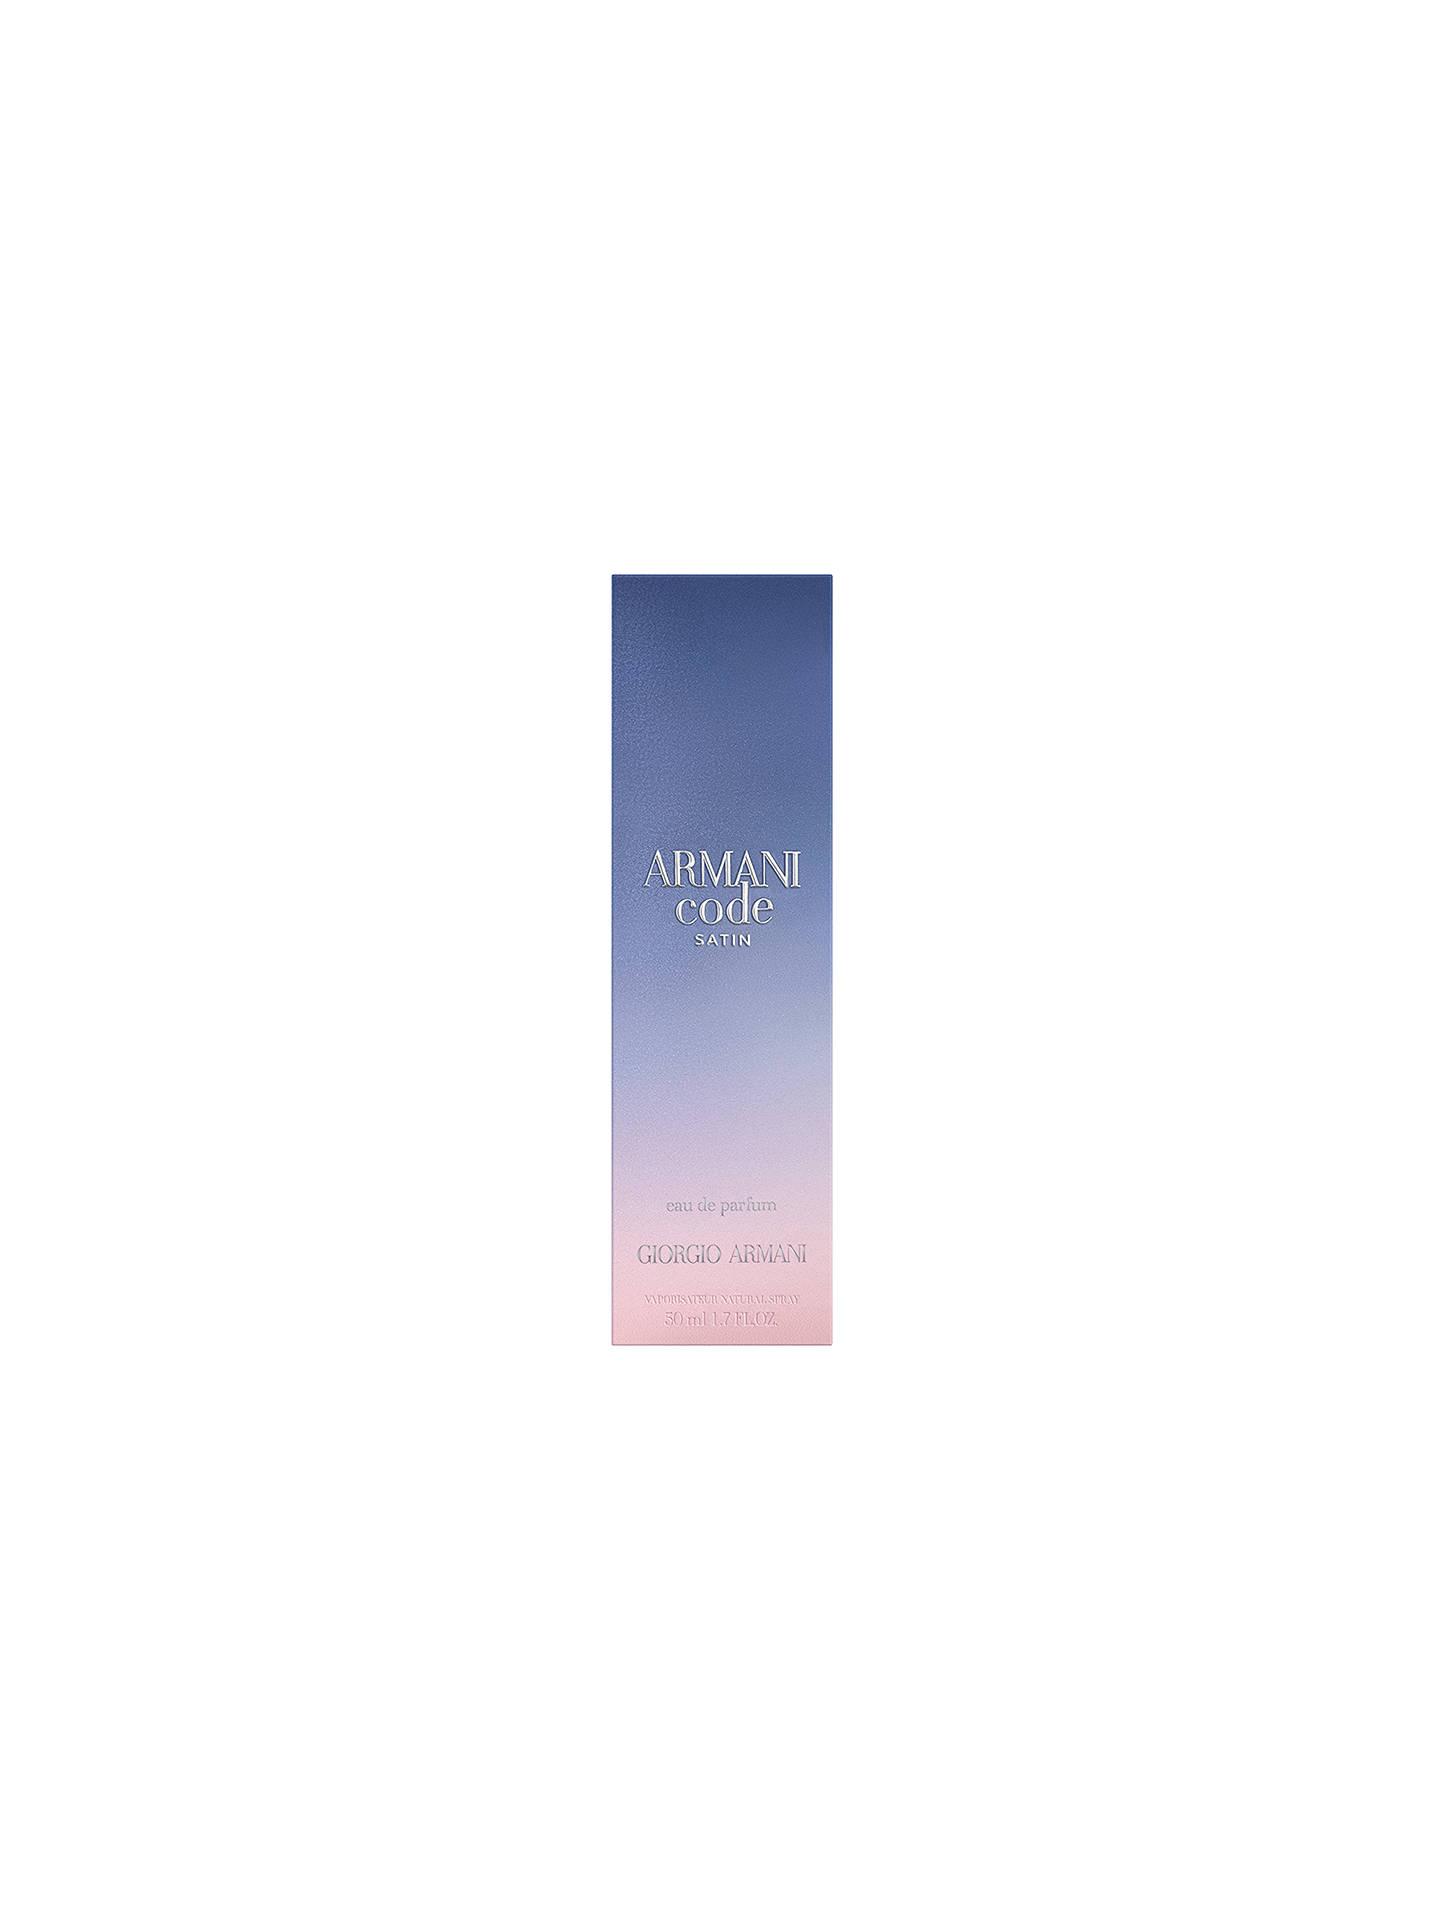 Giorgio Armani Code Femme Satin Eau De Parfum At John Lewis Partners